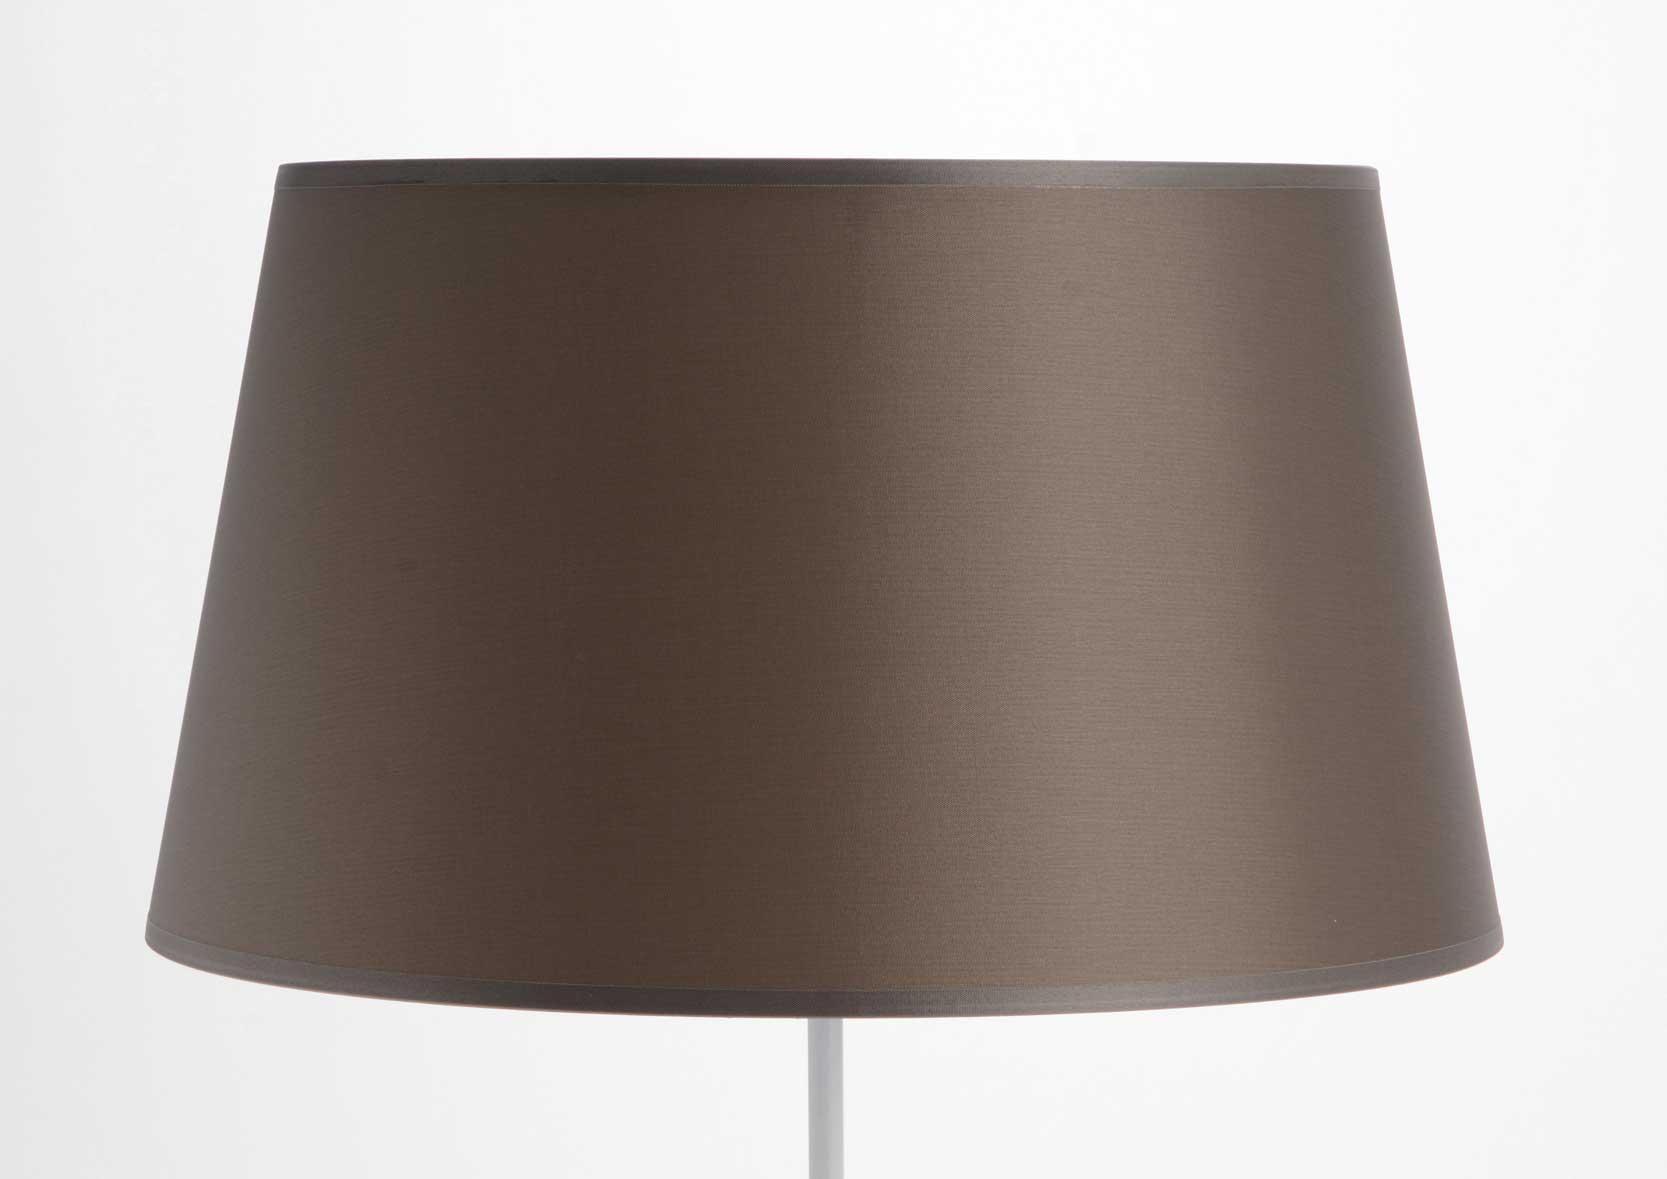 abat jour conique taffetas taupe. Black Bedroom Furniture Sets. Home Design Ideas